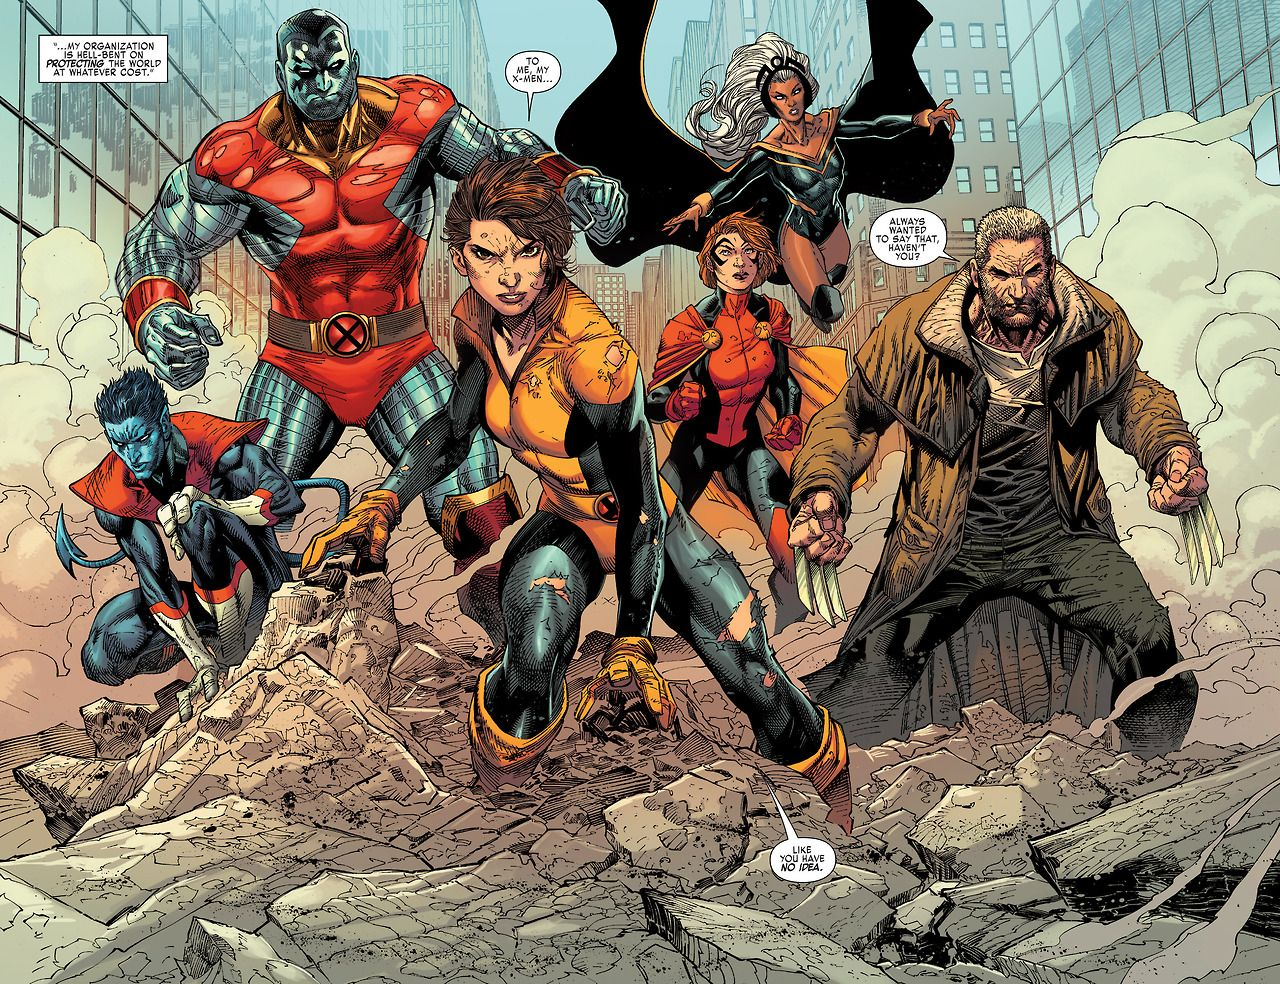 Kitty Pryde S X Men Group Shot In X Men Gold 01 2017 Comics X Men Marvel Comics